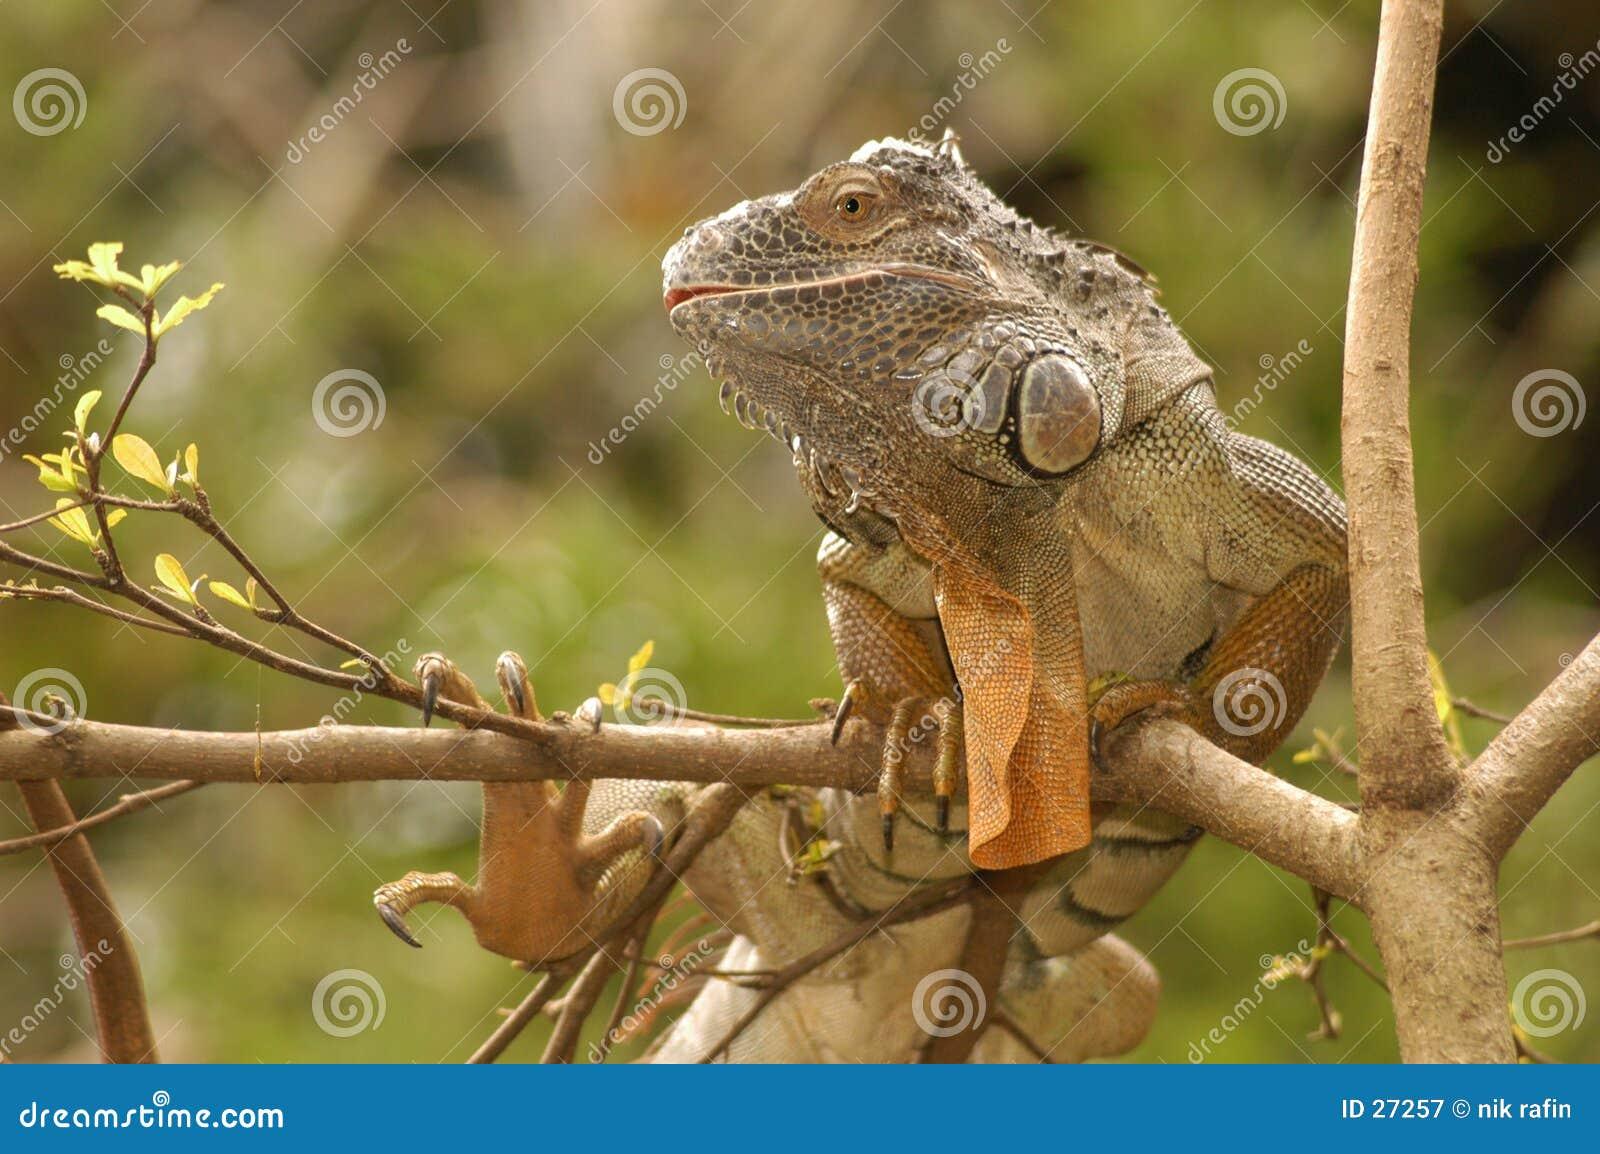 Iguana exotica